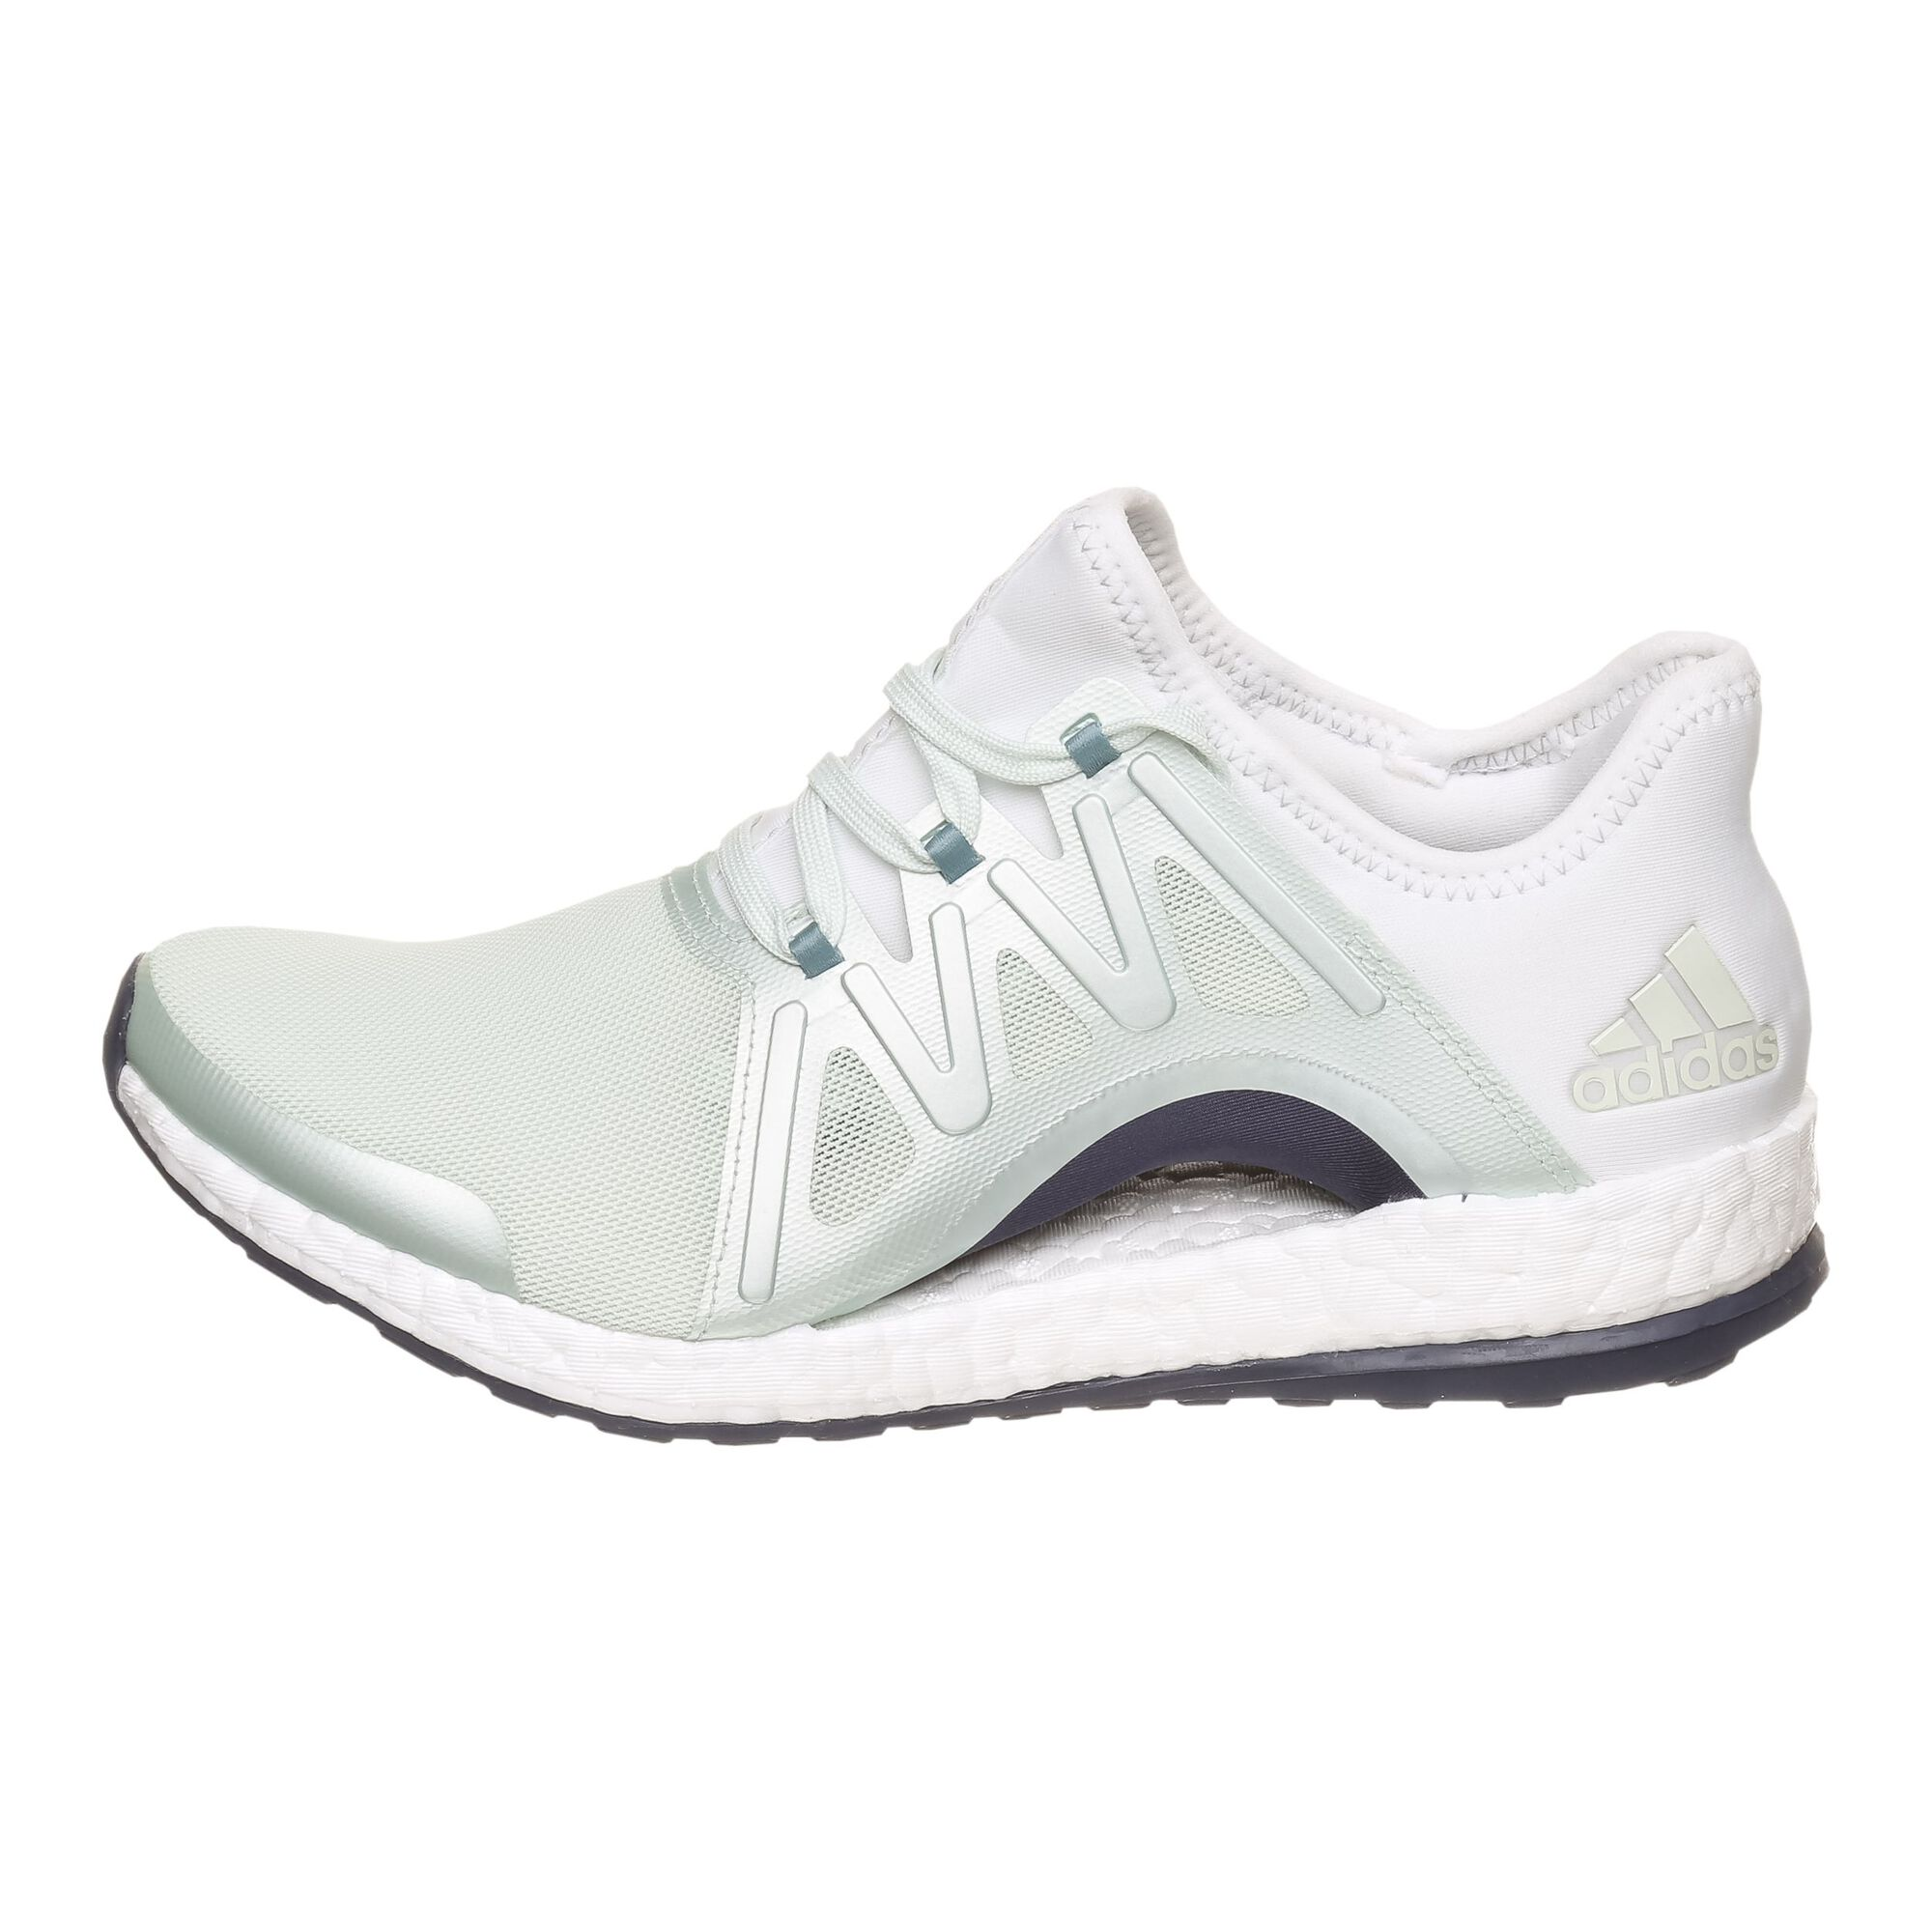 premium selection 9dbe0 a22b8 adidas · adidas · adidas · adidas · adidas · adidas · adidas · adidas ·  adidas · adidas · adidas · adidas · adidas. Pure Boost Xpose Women ...